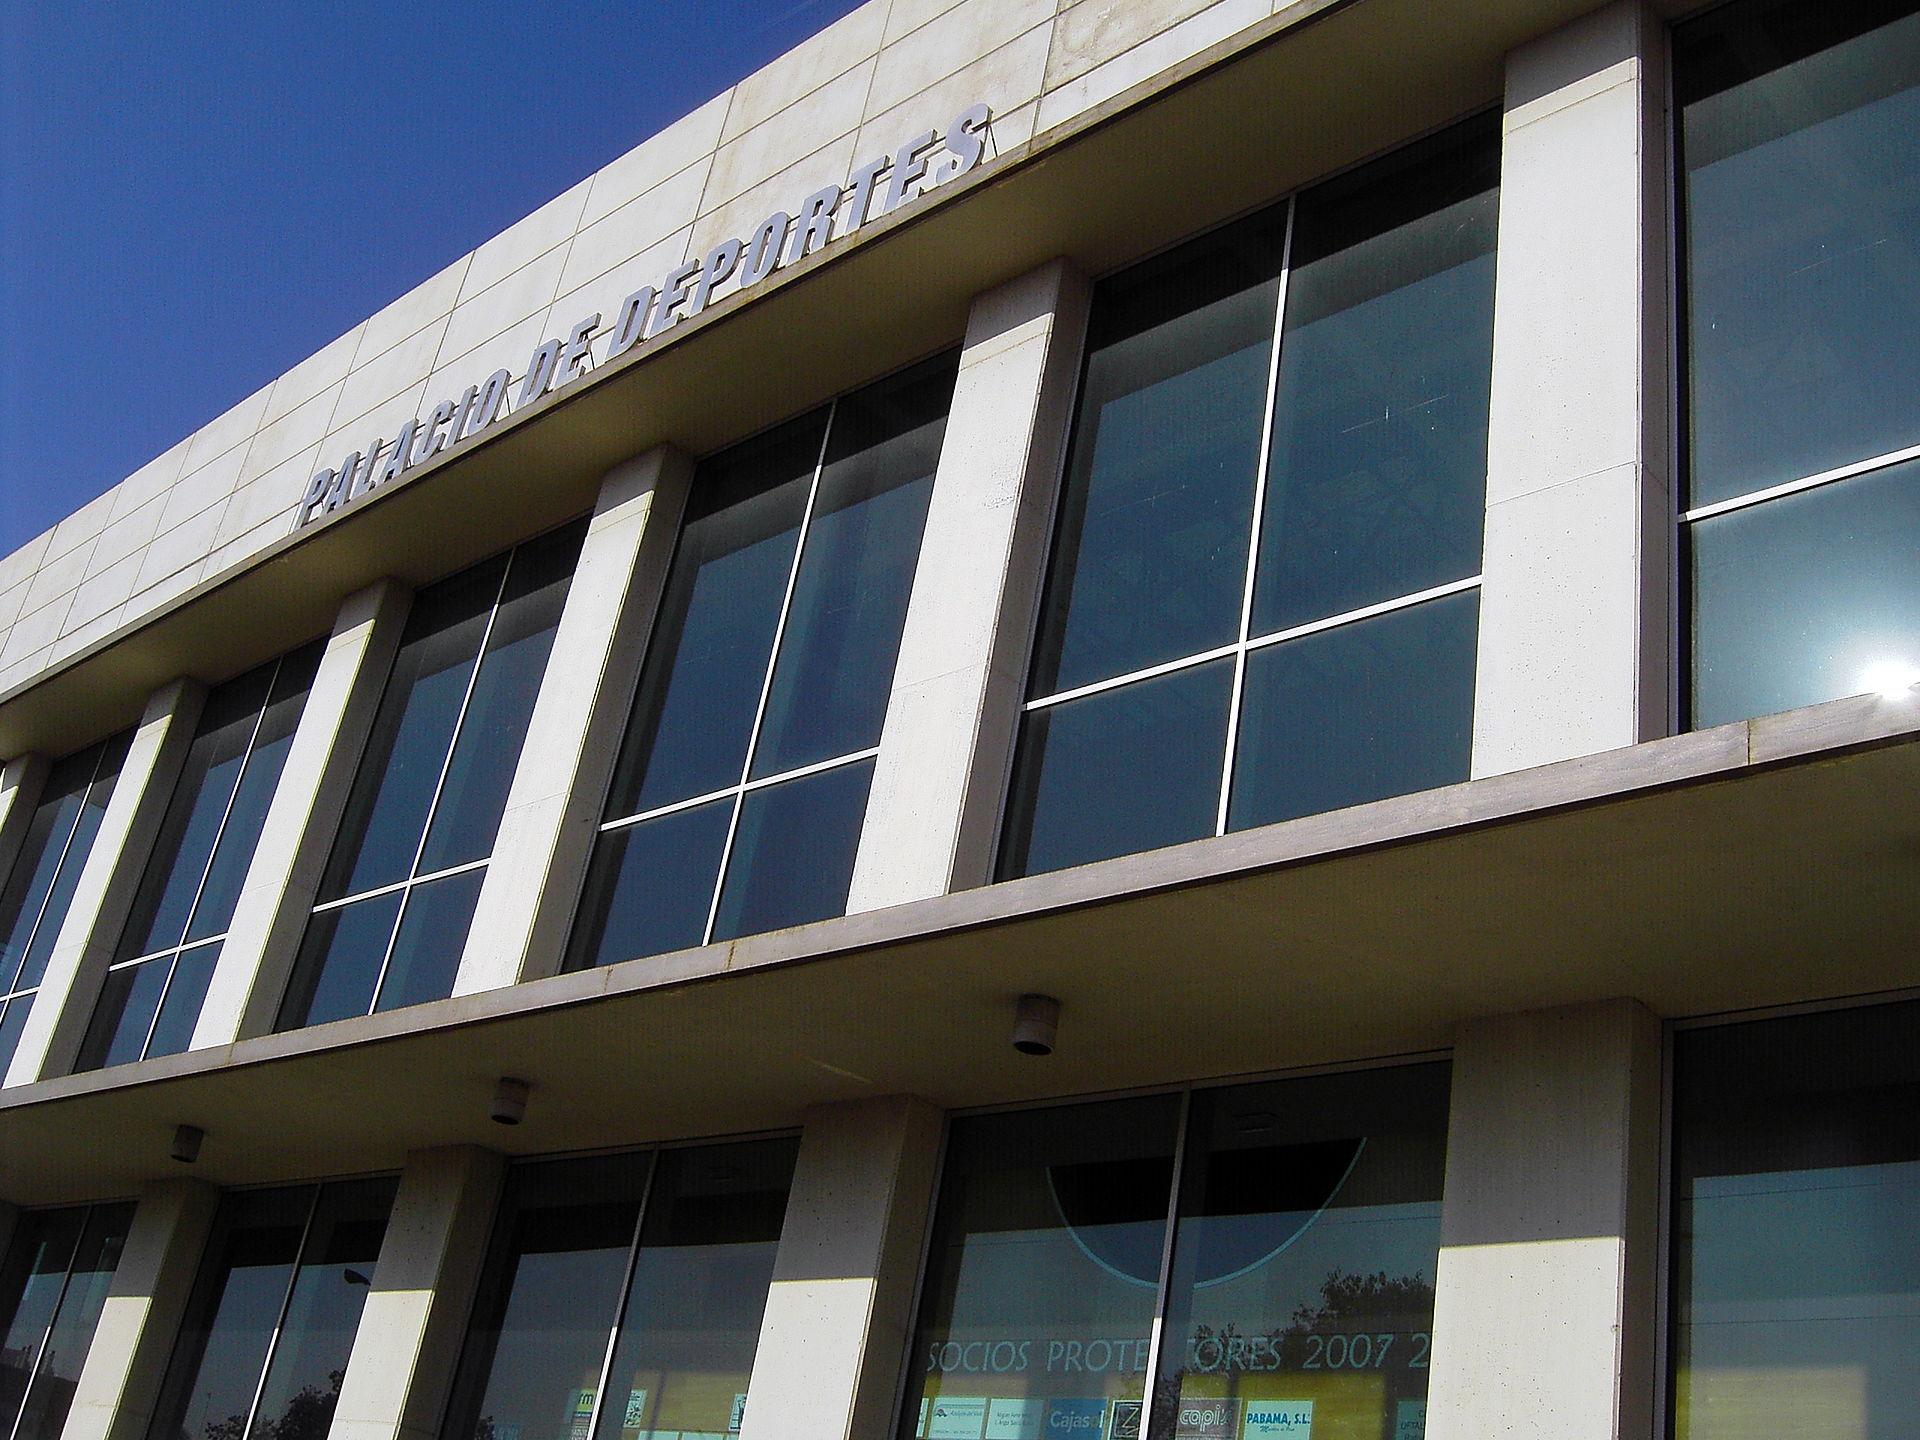 Club Baloncesto Huelva la Luz - Wikipedia, la enciclopedia libre